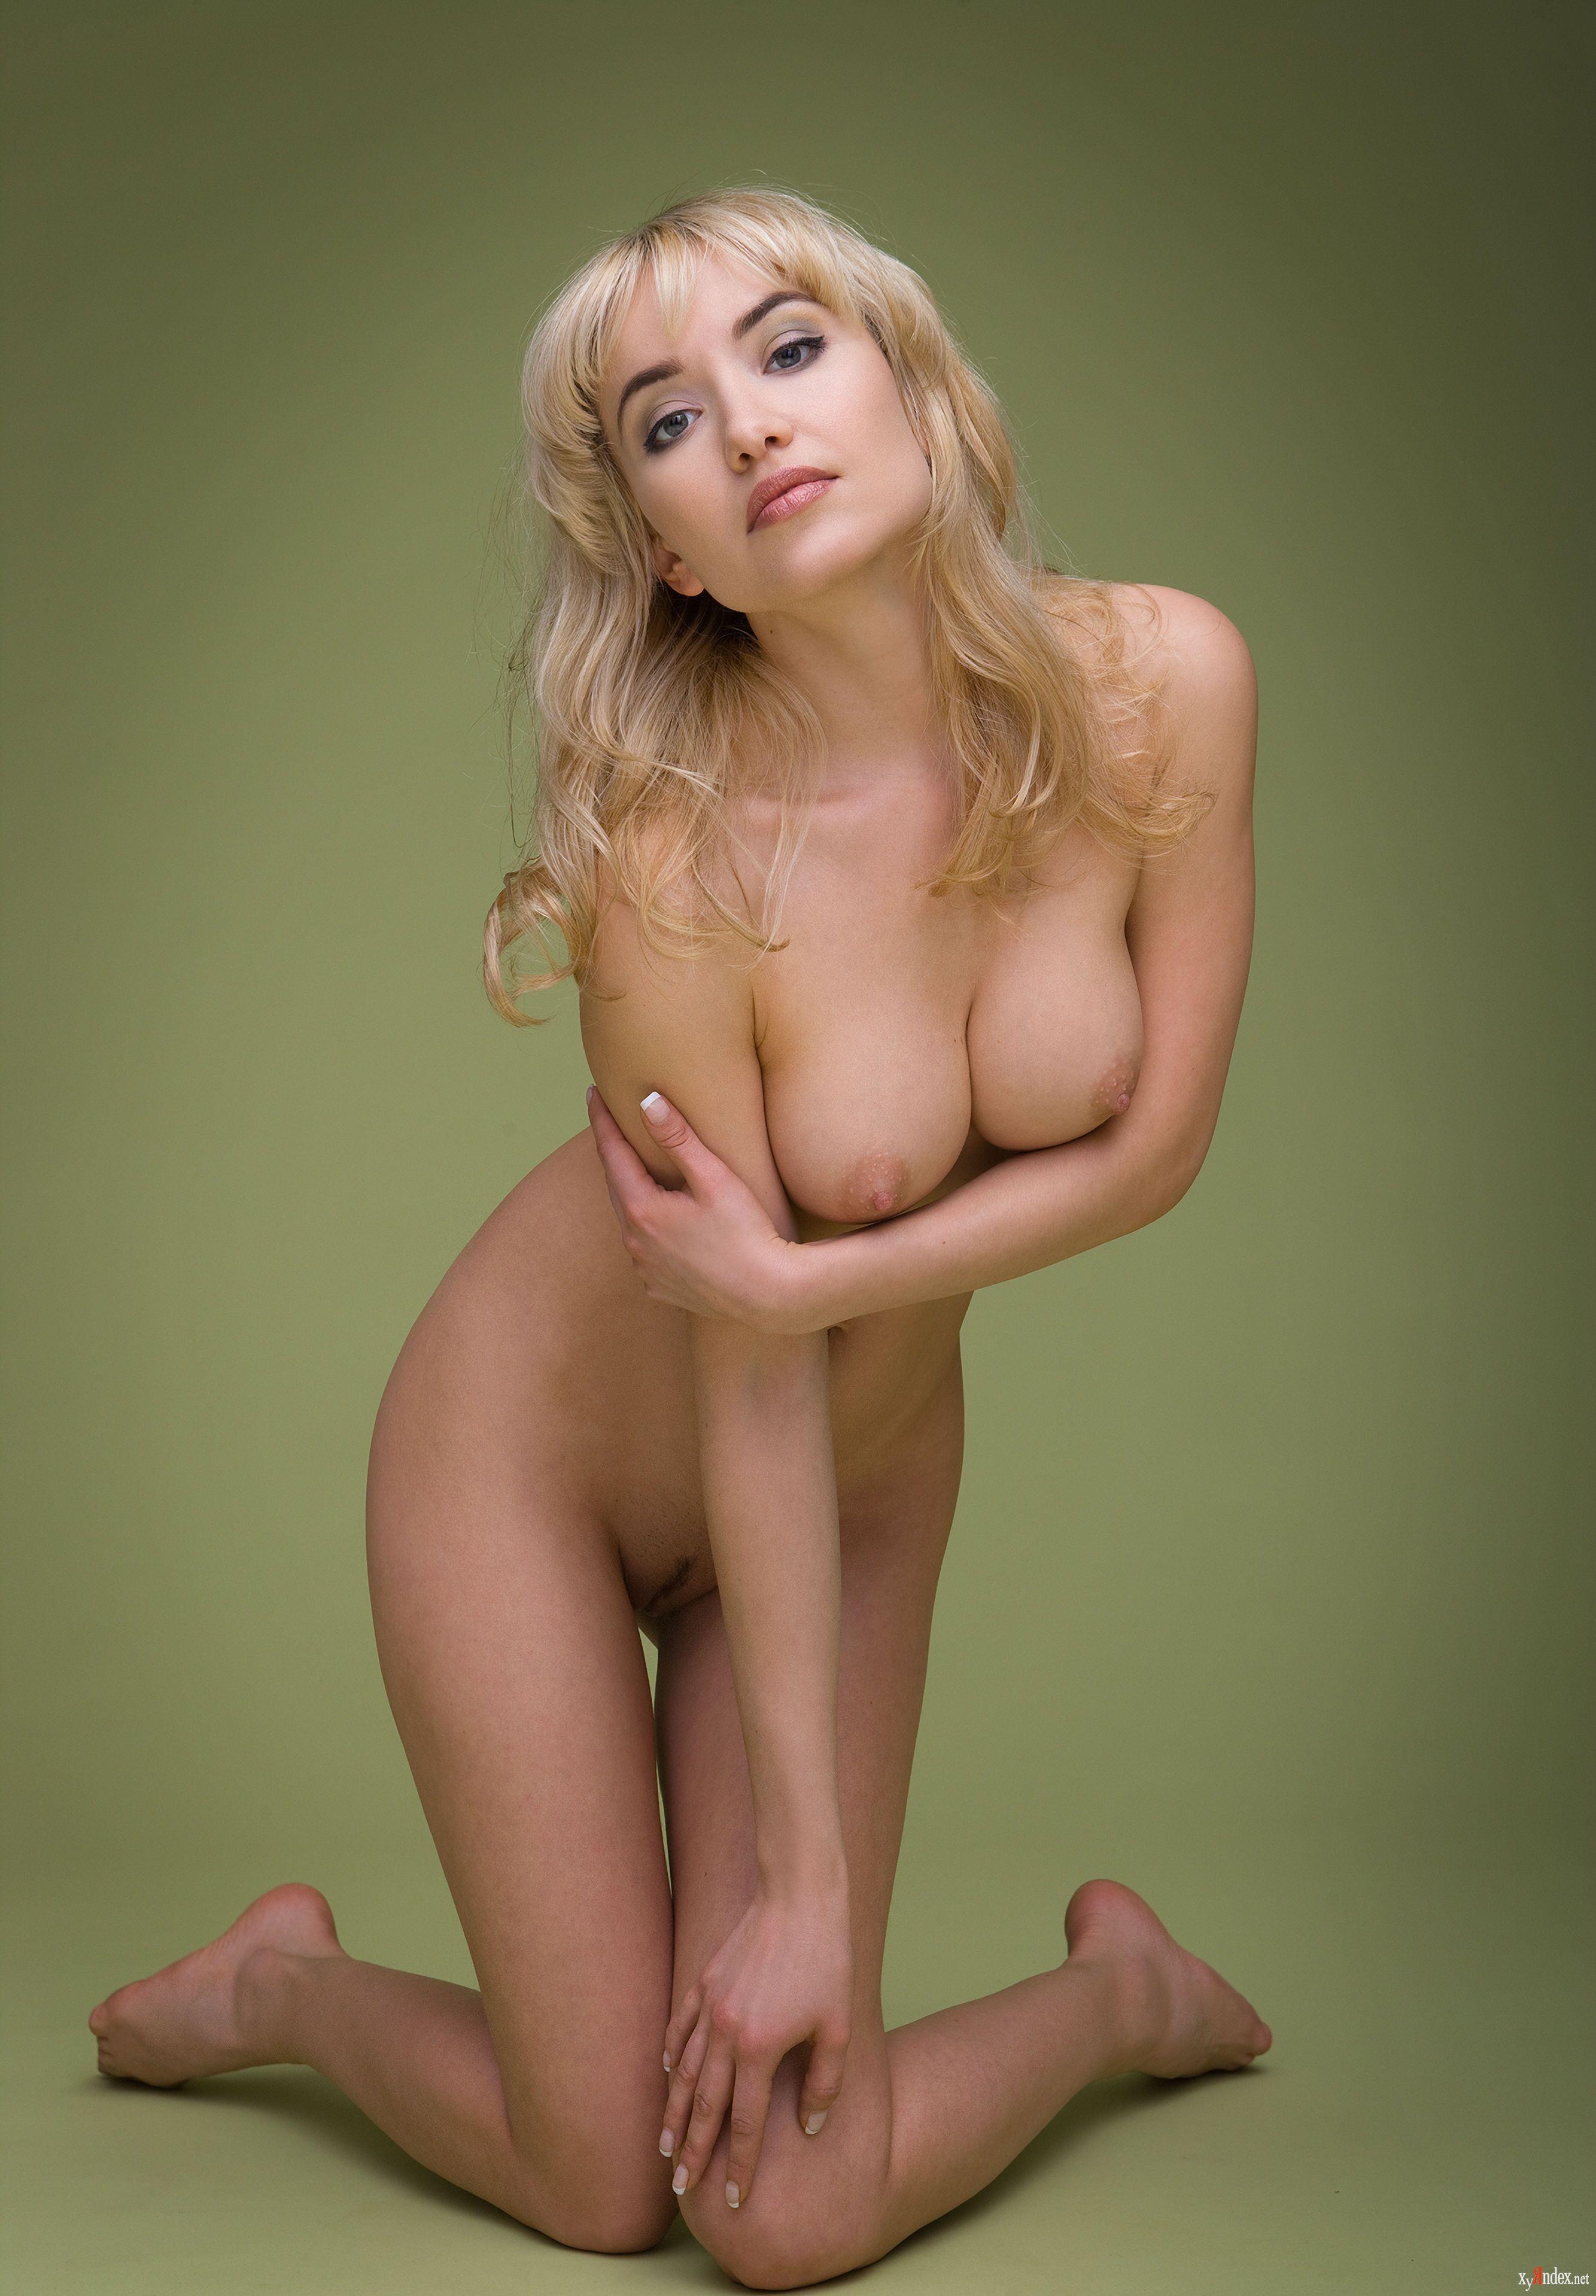 Beautiful statuesque blonde posing nude stock photo